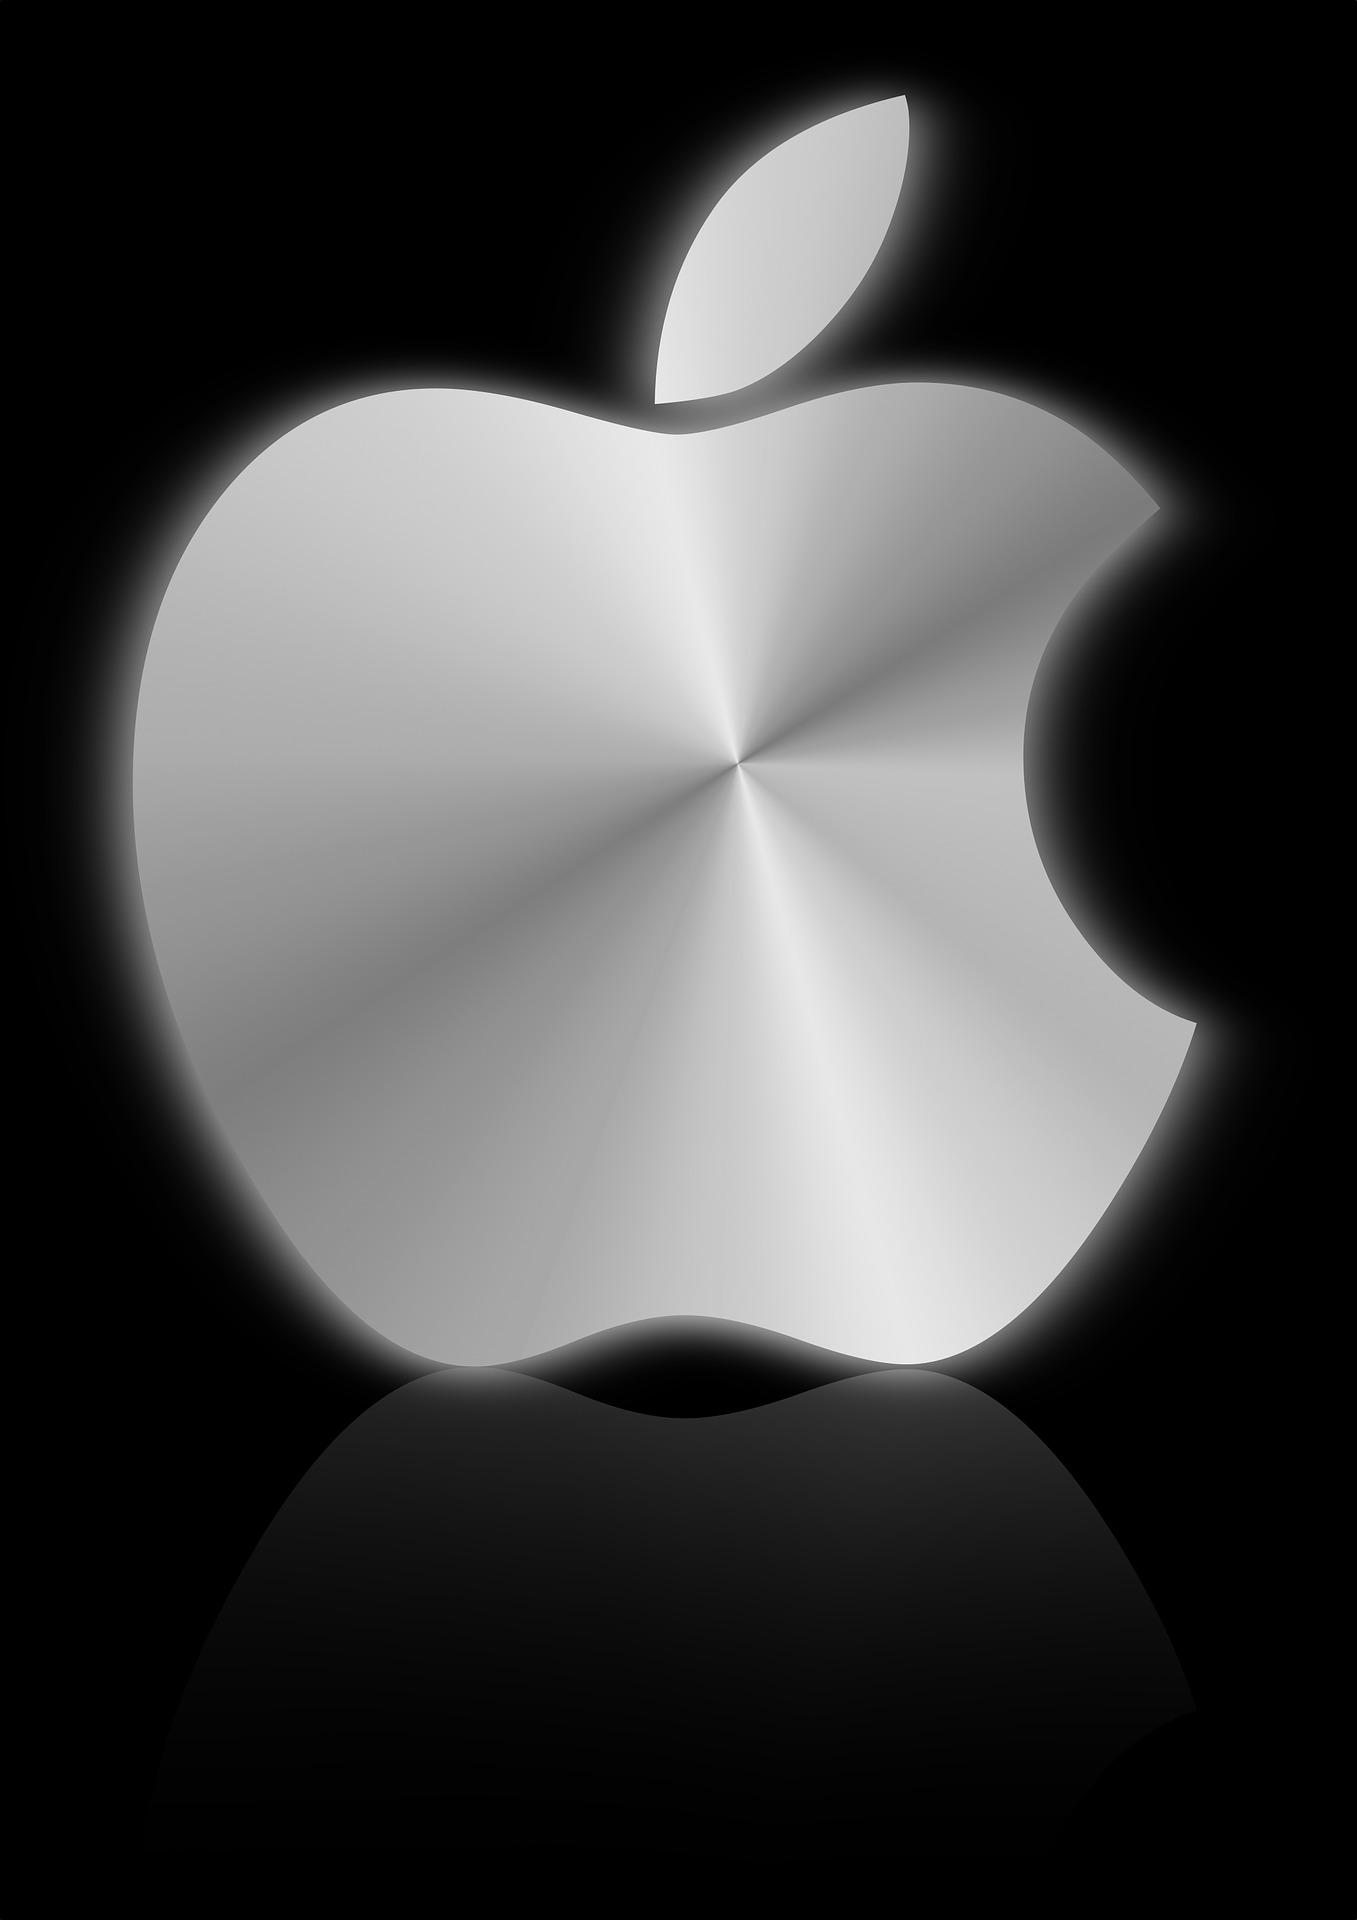 recupero dati server apple